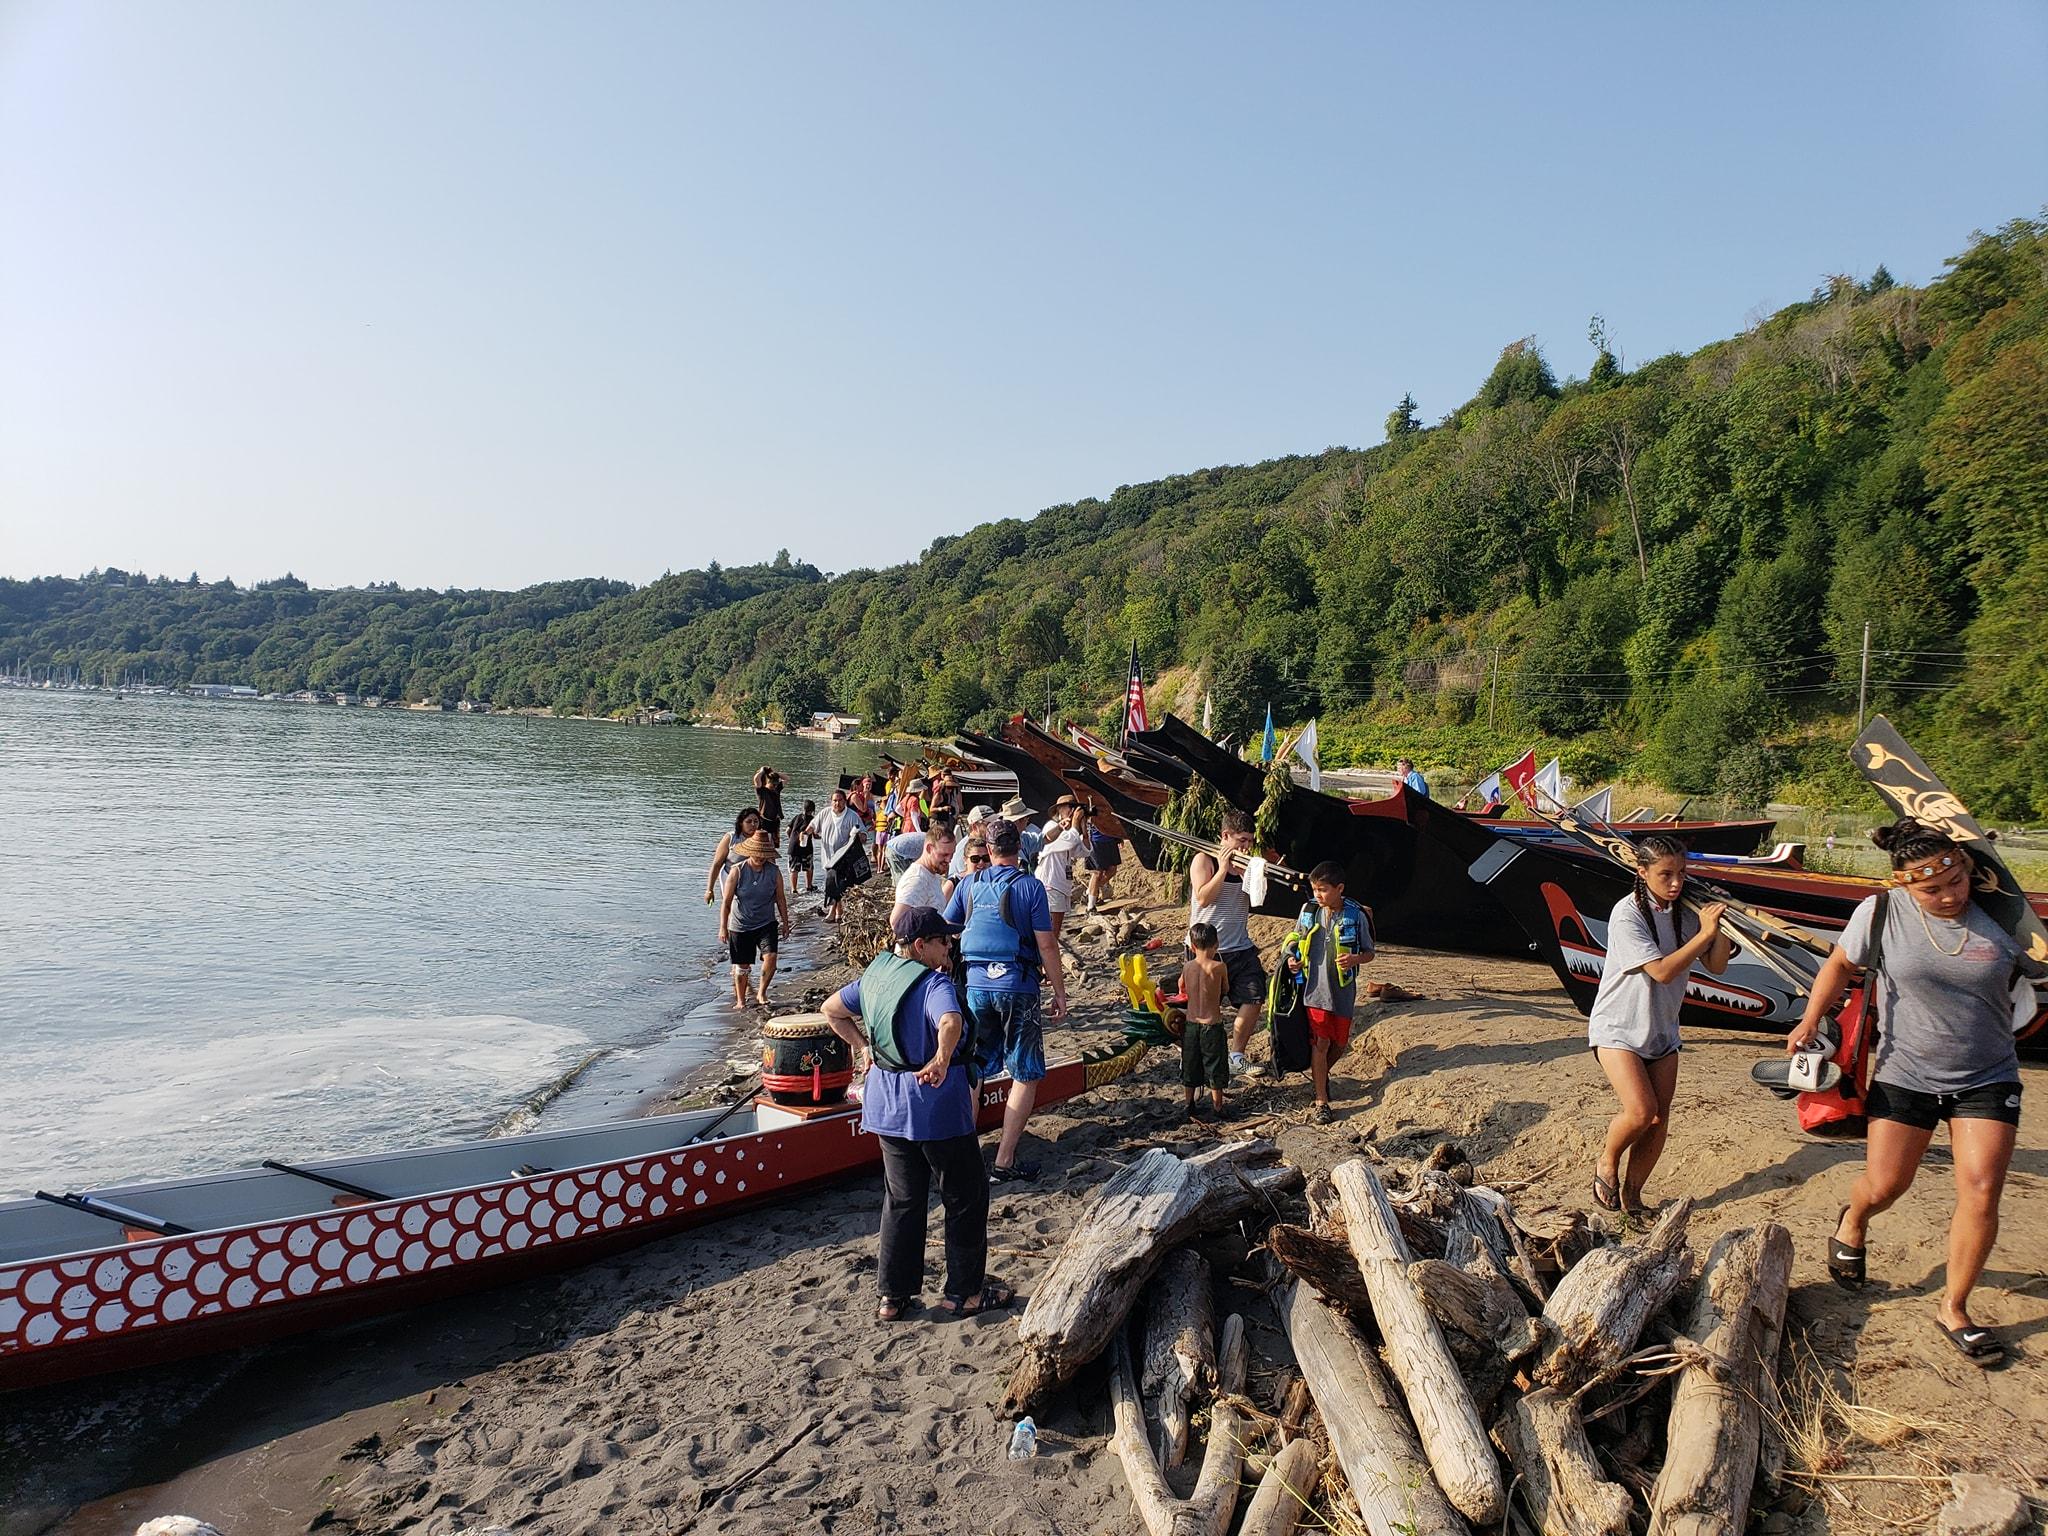 Tacoma Dragon Boat Association